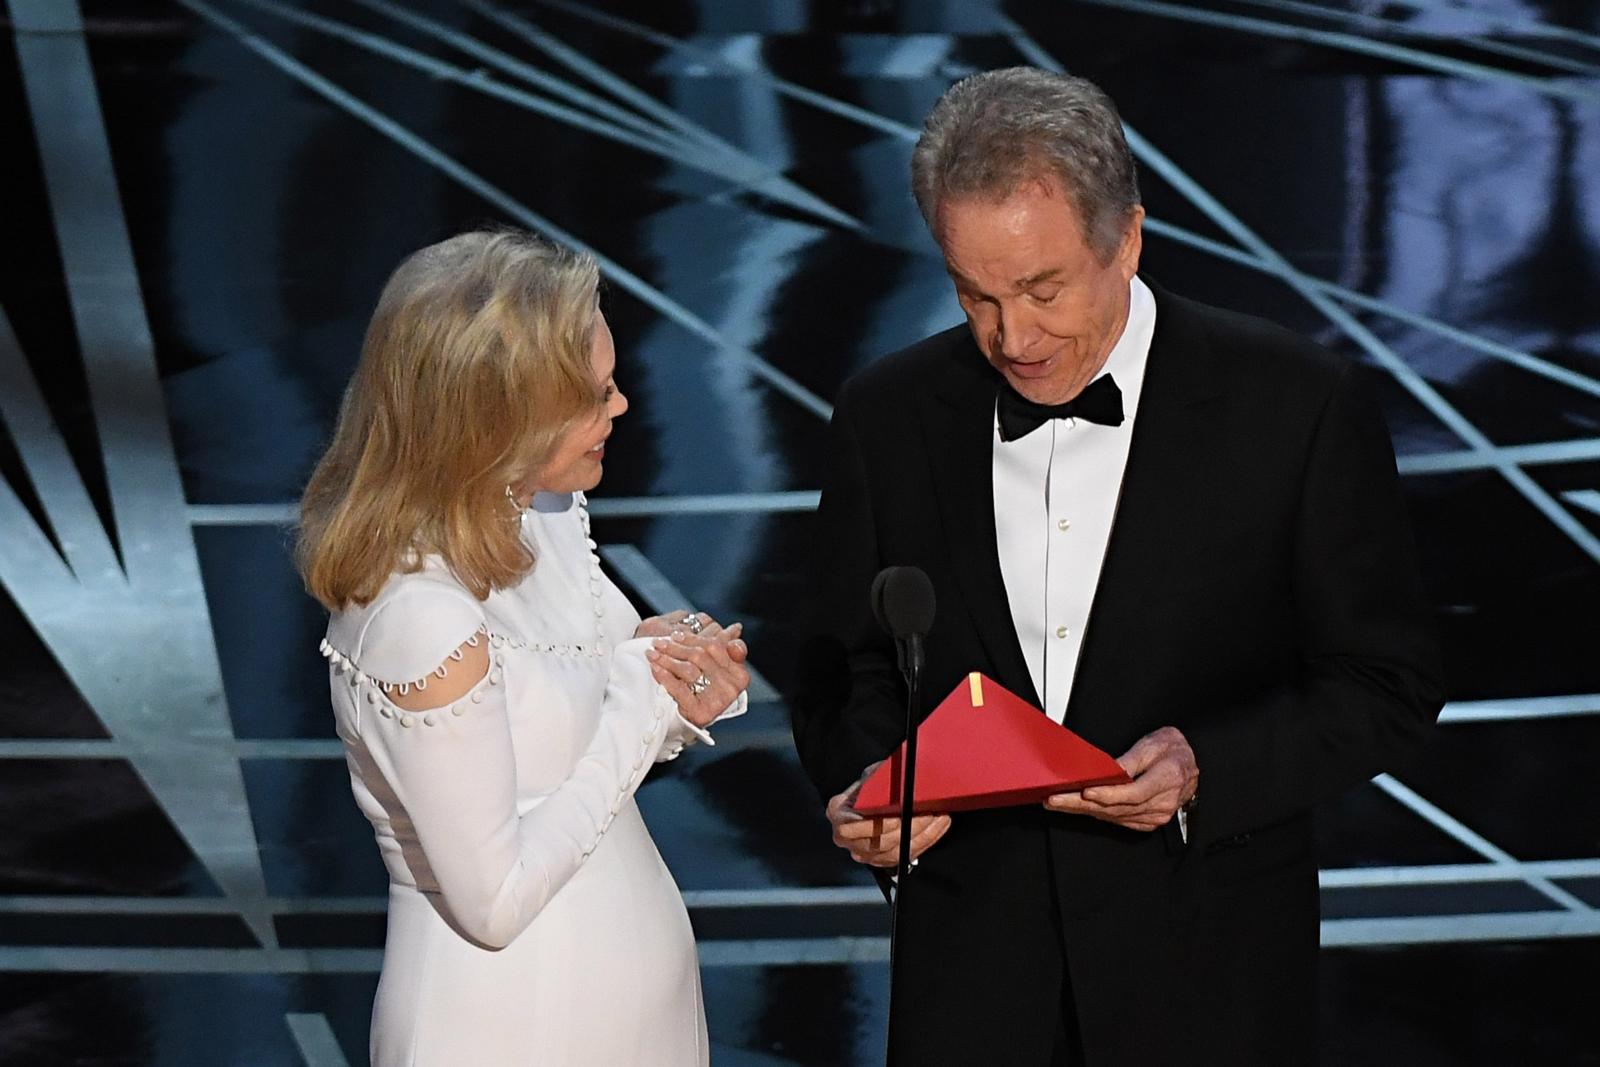 Oscars 2017: Faye Dunaway and Warren Beatty